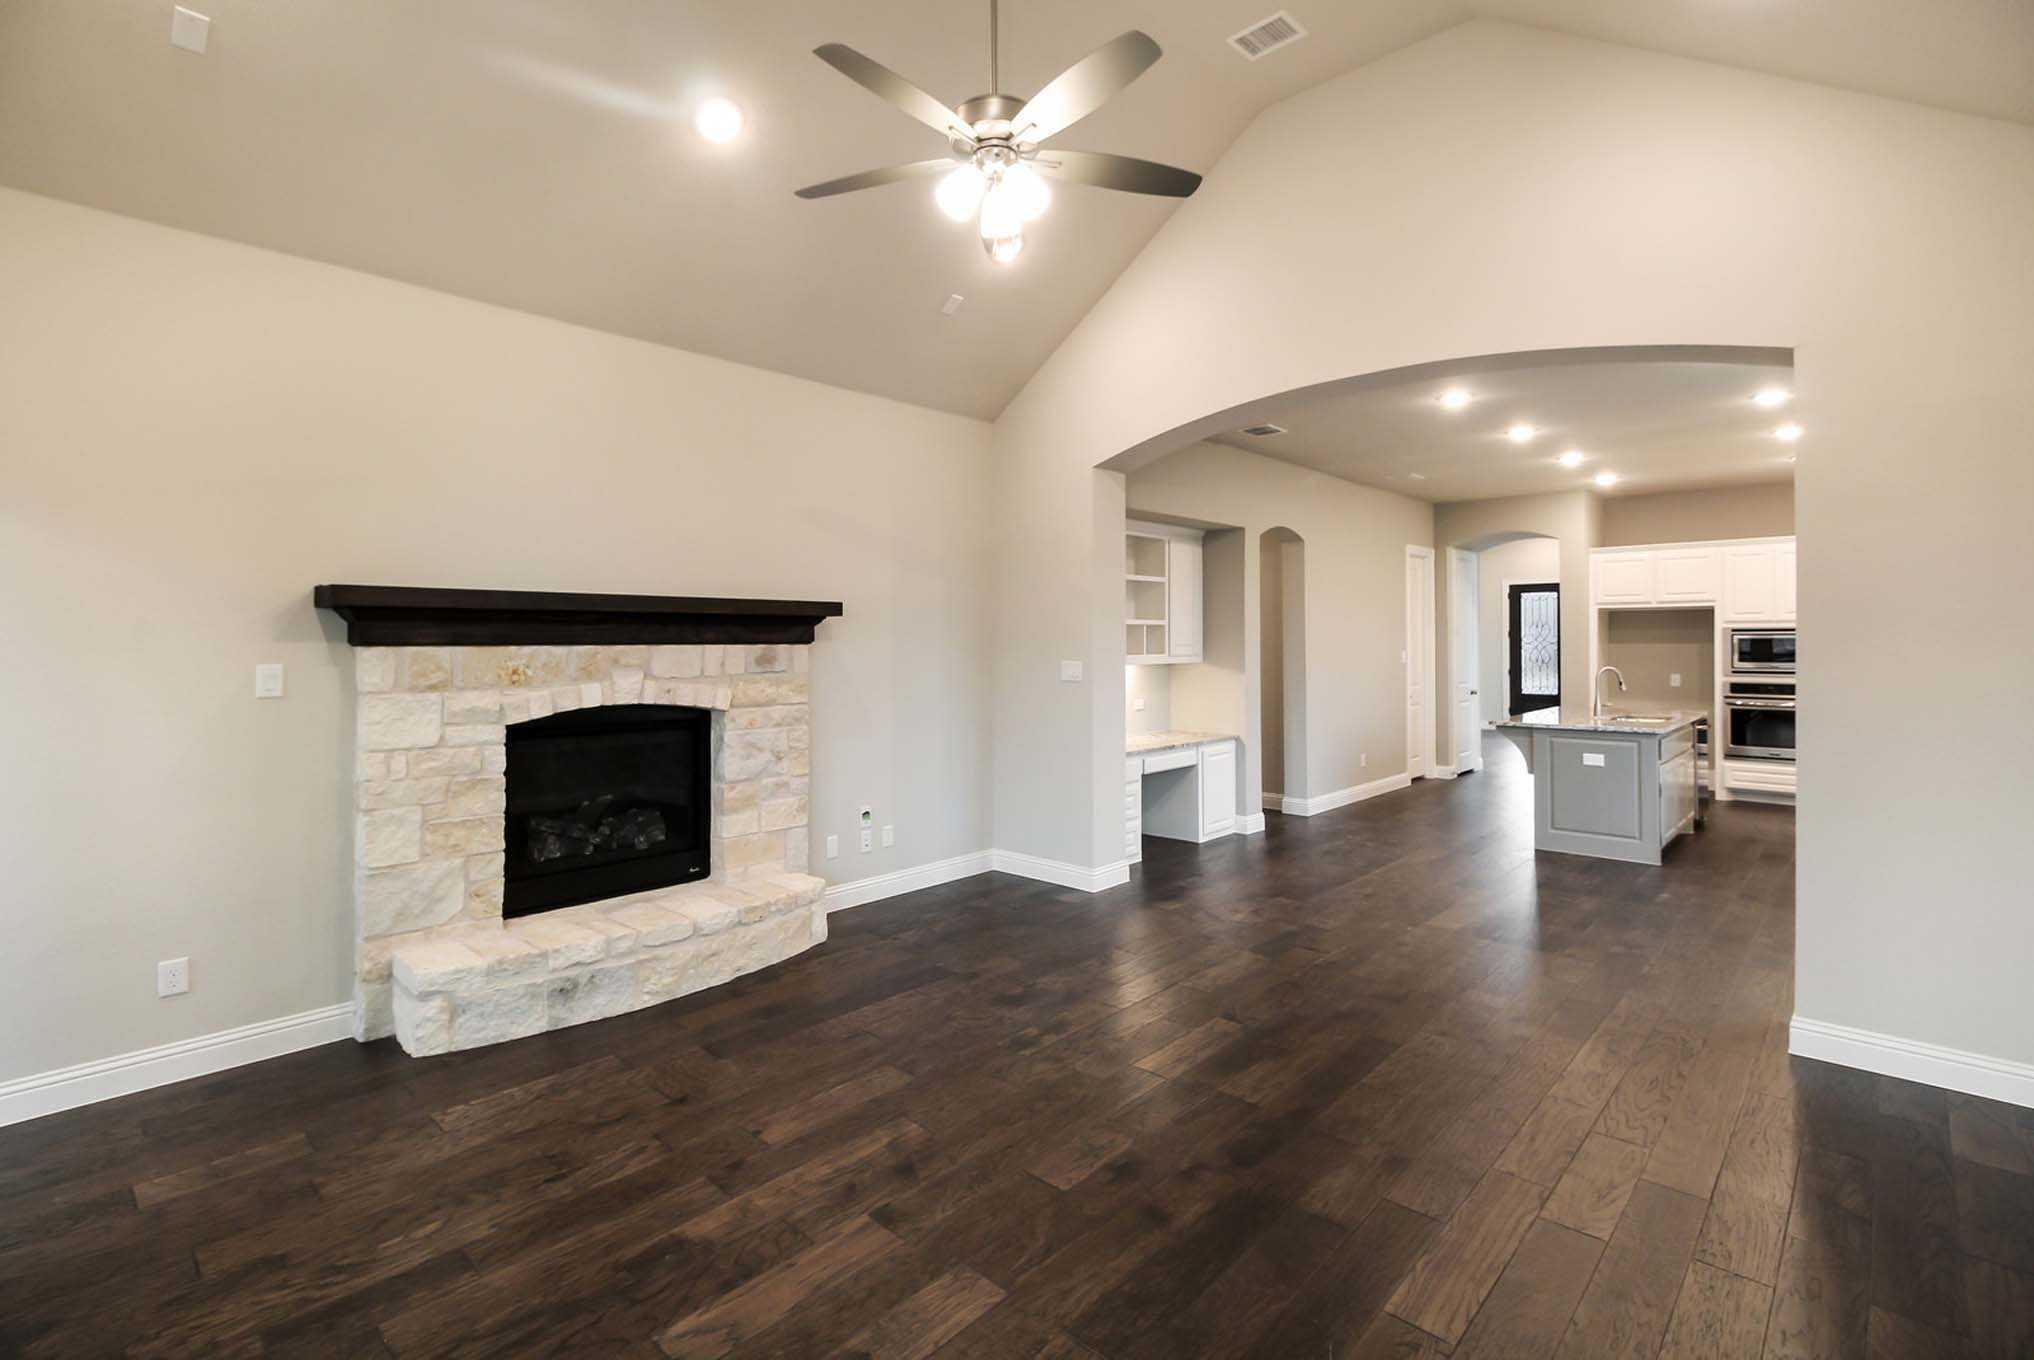 New Home For Sale 13924 Round Prairie Lane Frisco Tx 75035